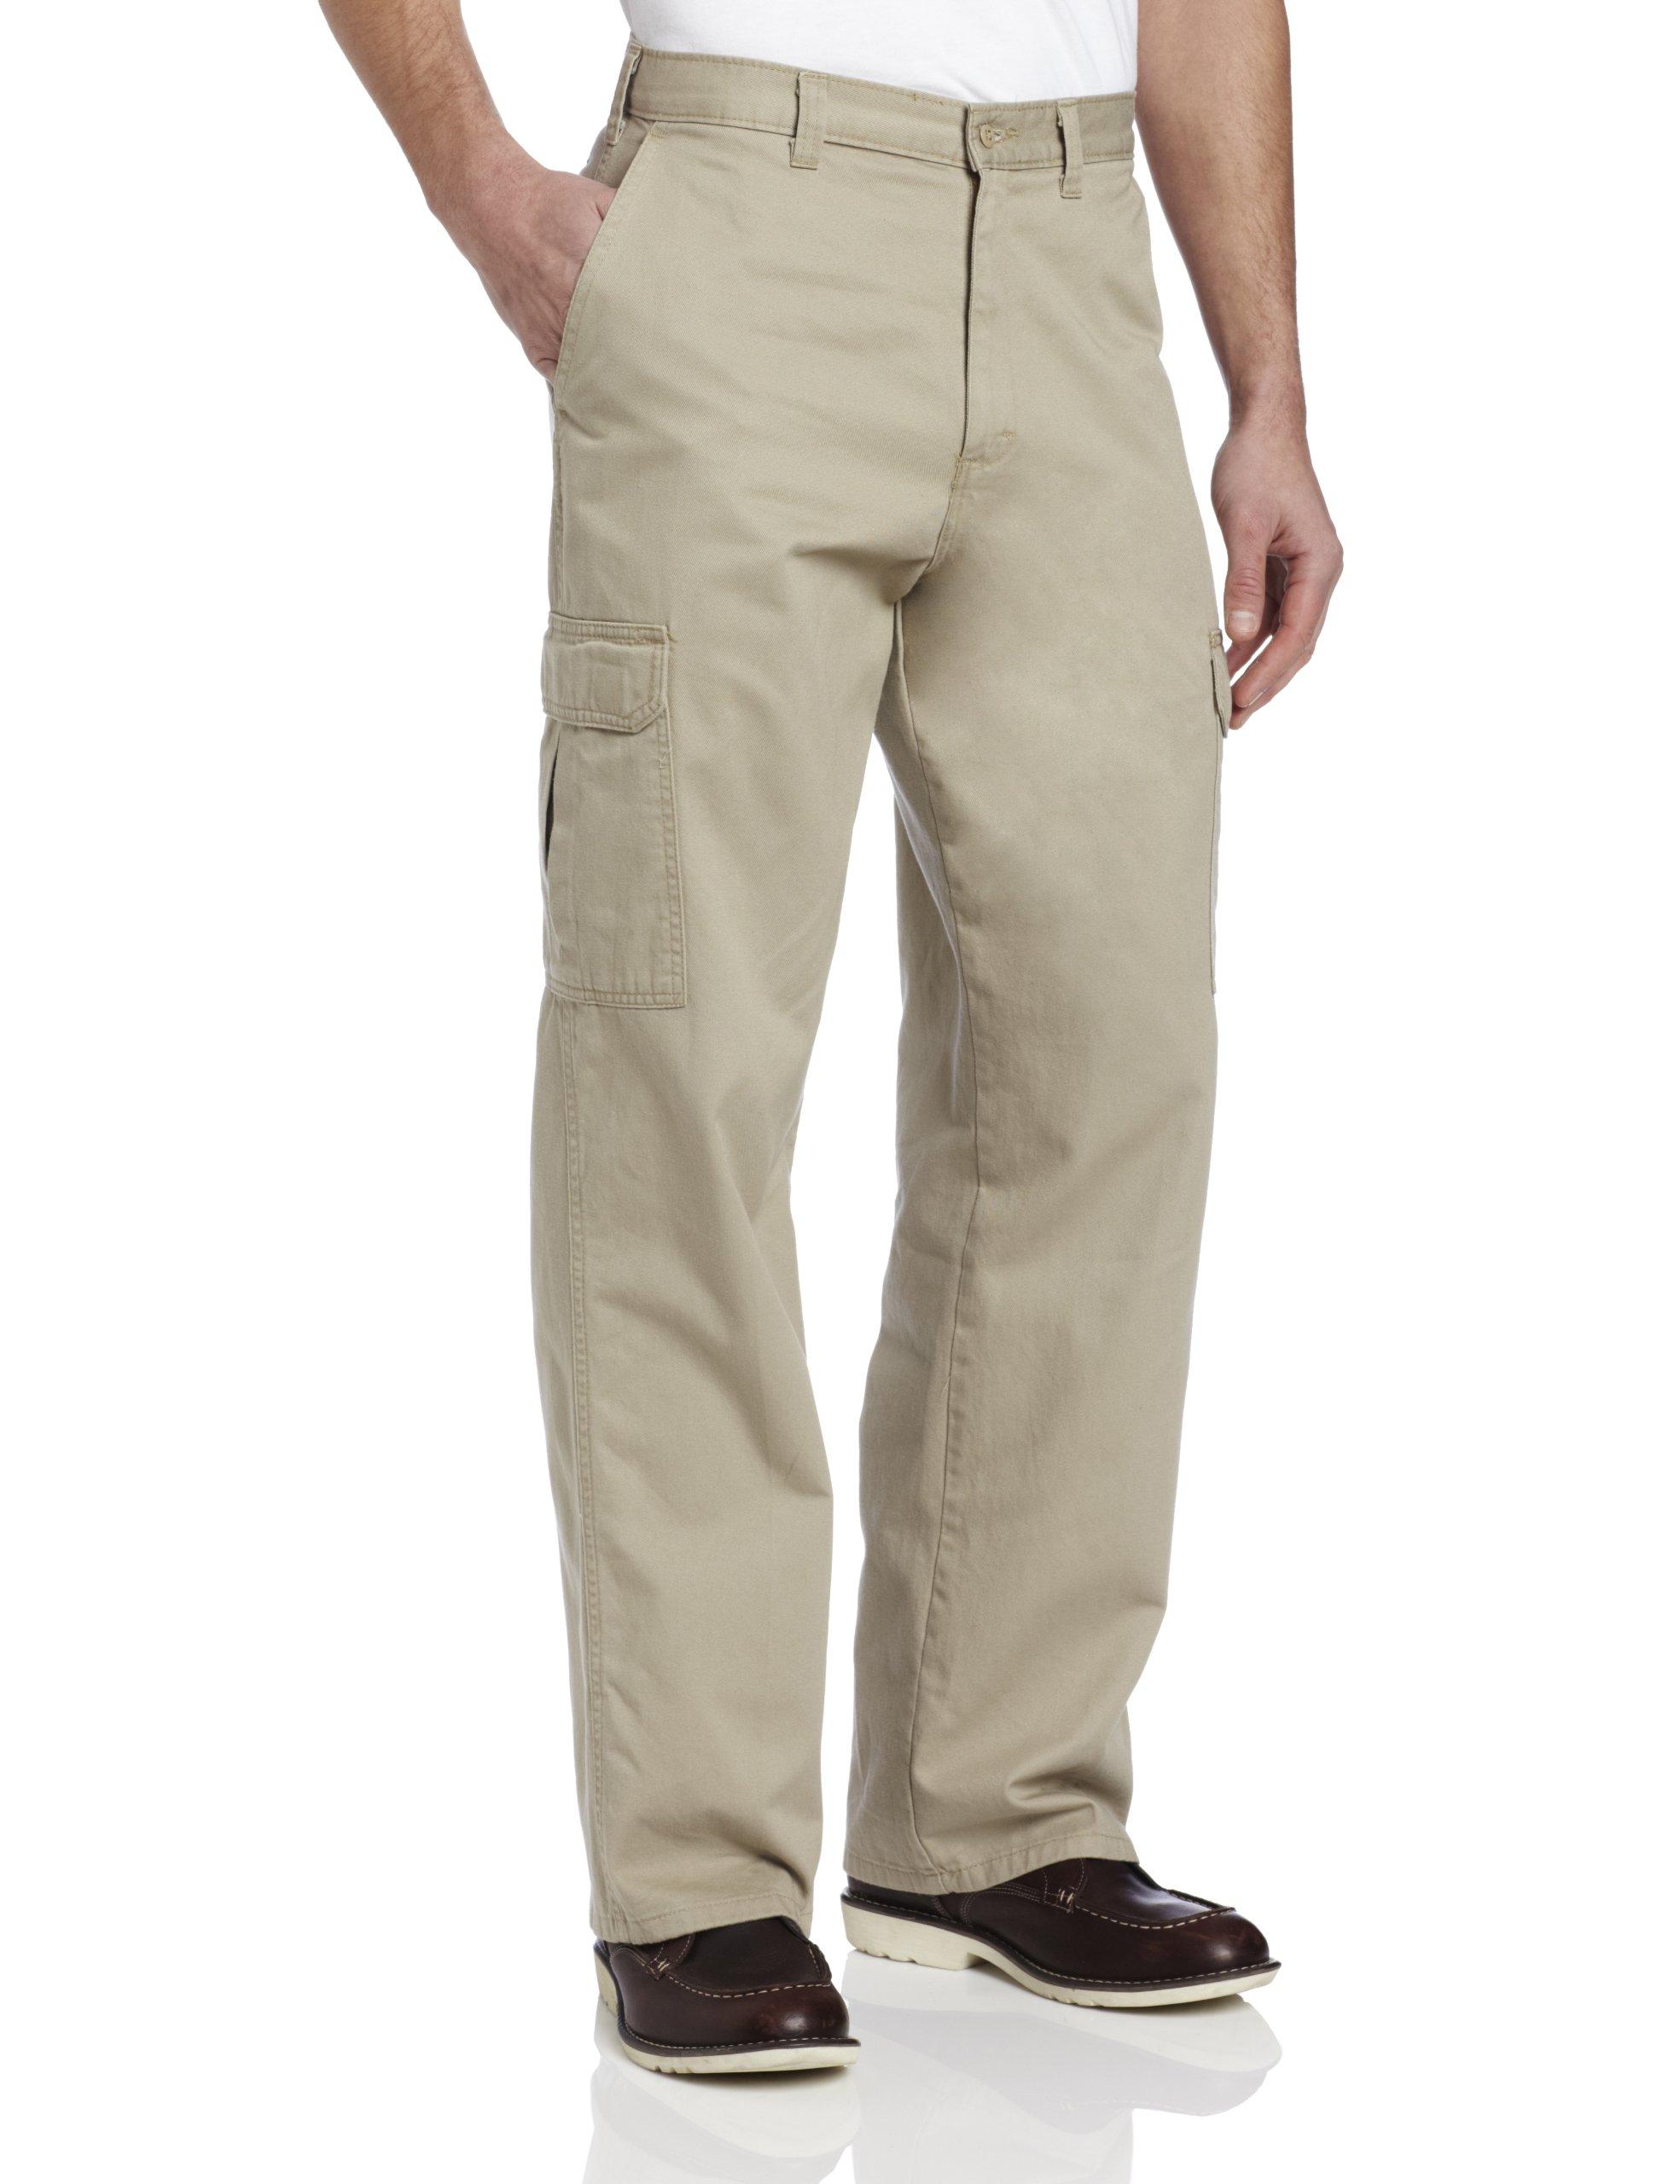 Dickies Men's Loose Fit Cargo Work Pant, Khaki, 38x30 by dickies